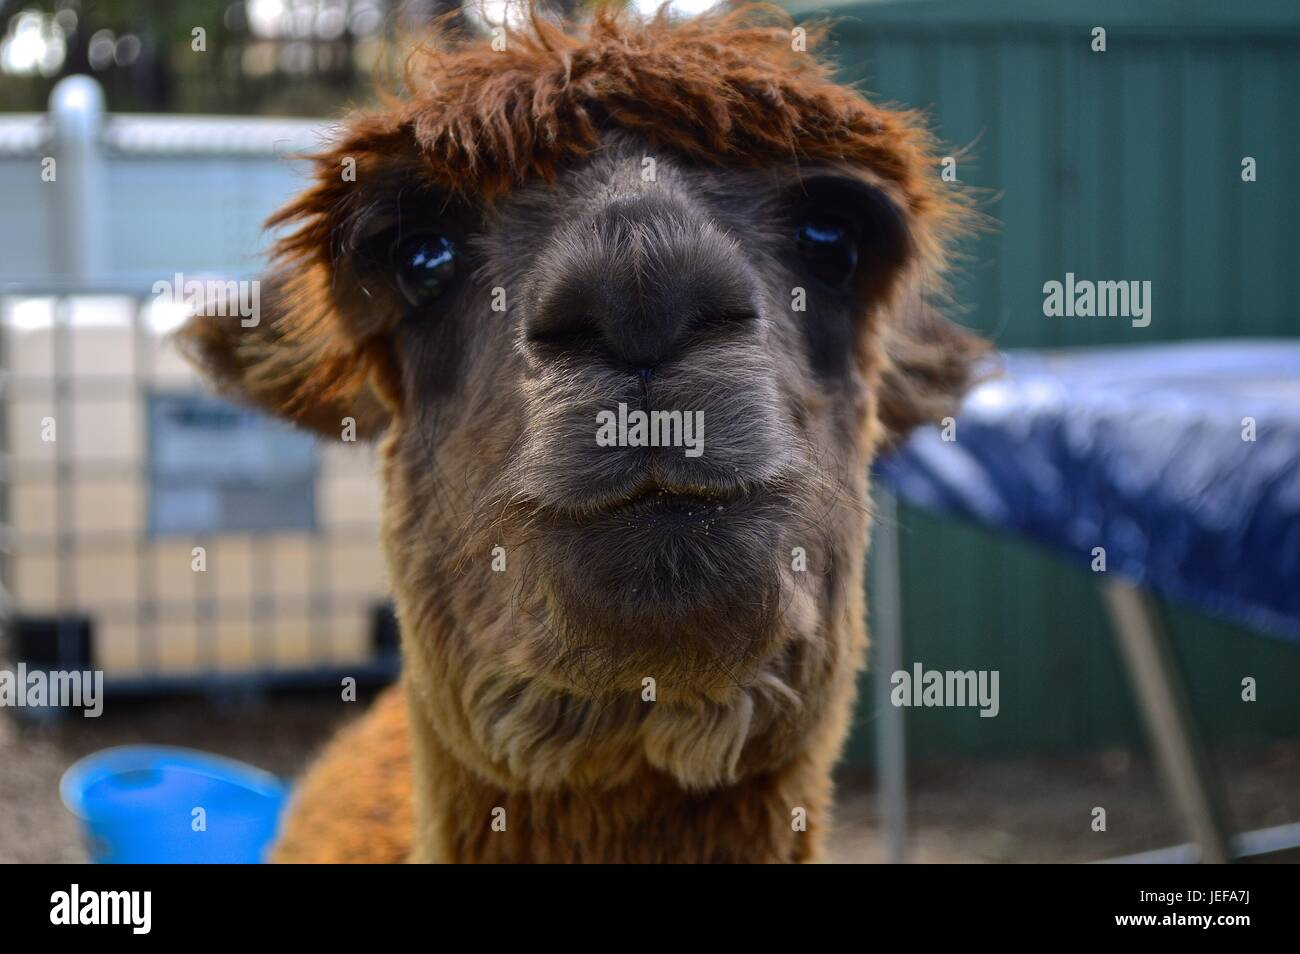 Braune Suri Alpaka Gesicht Stockbild